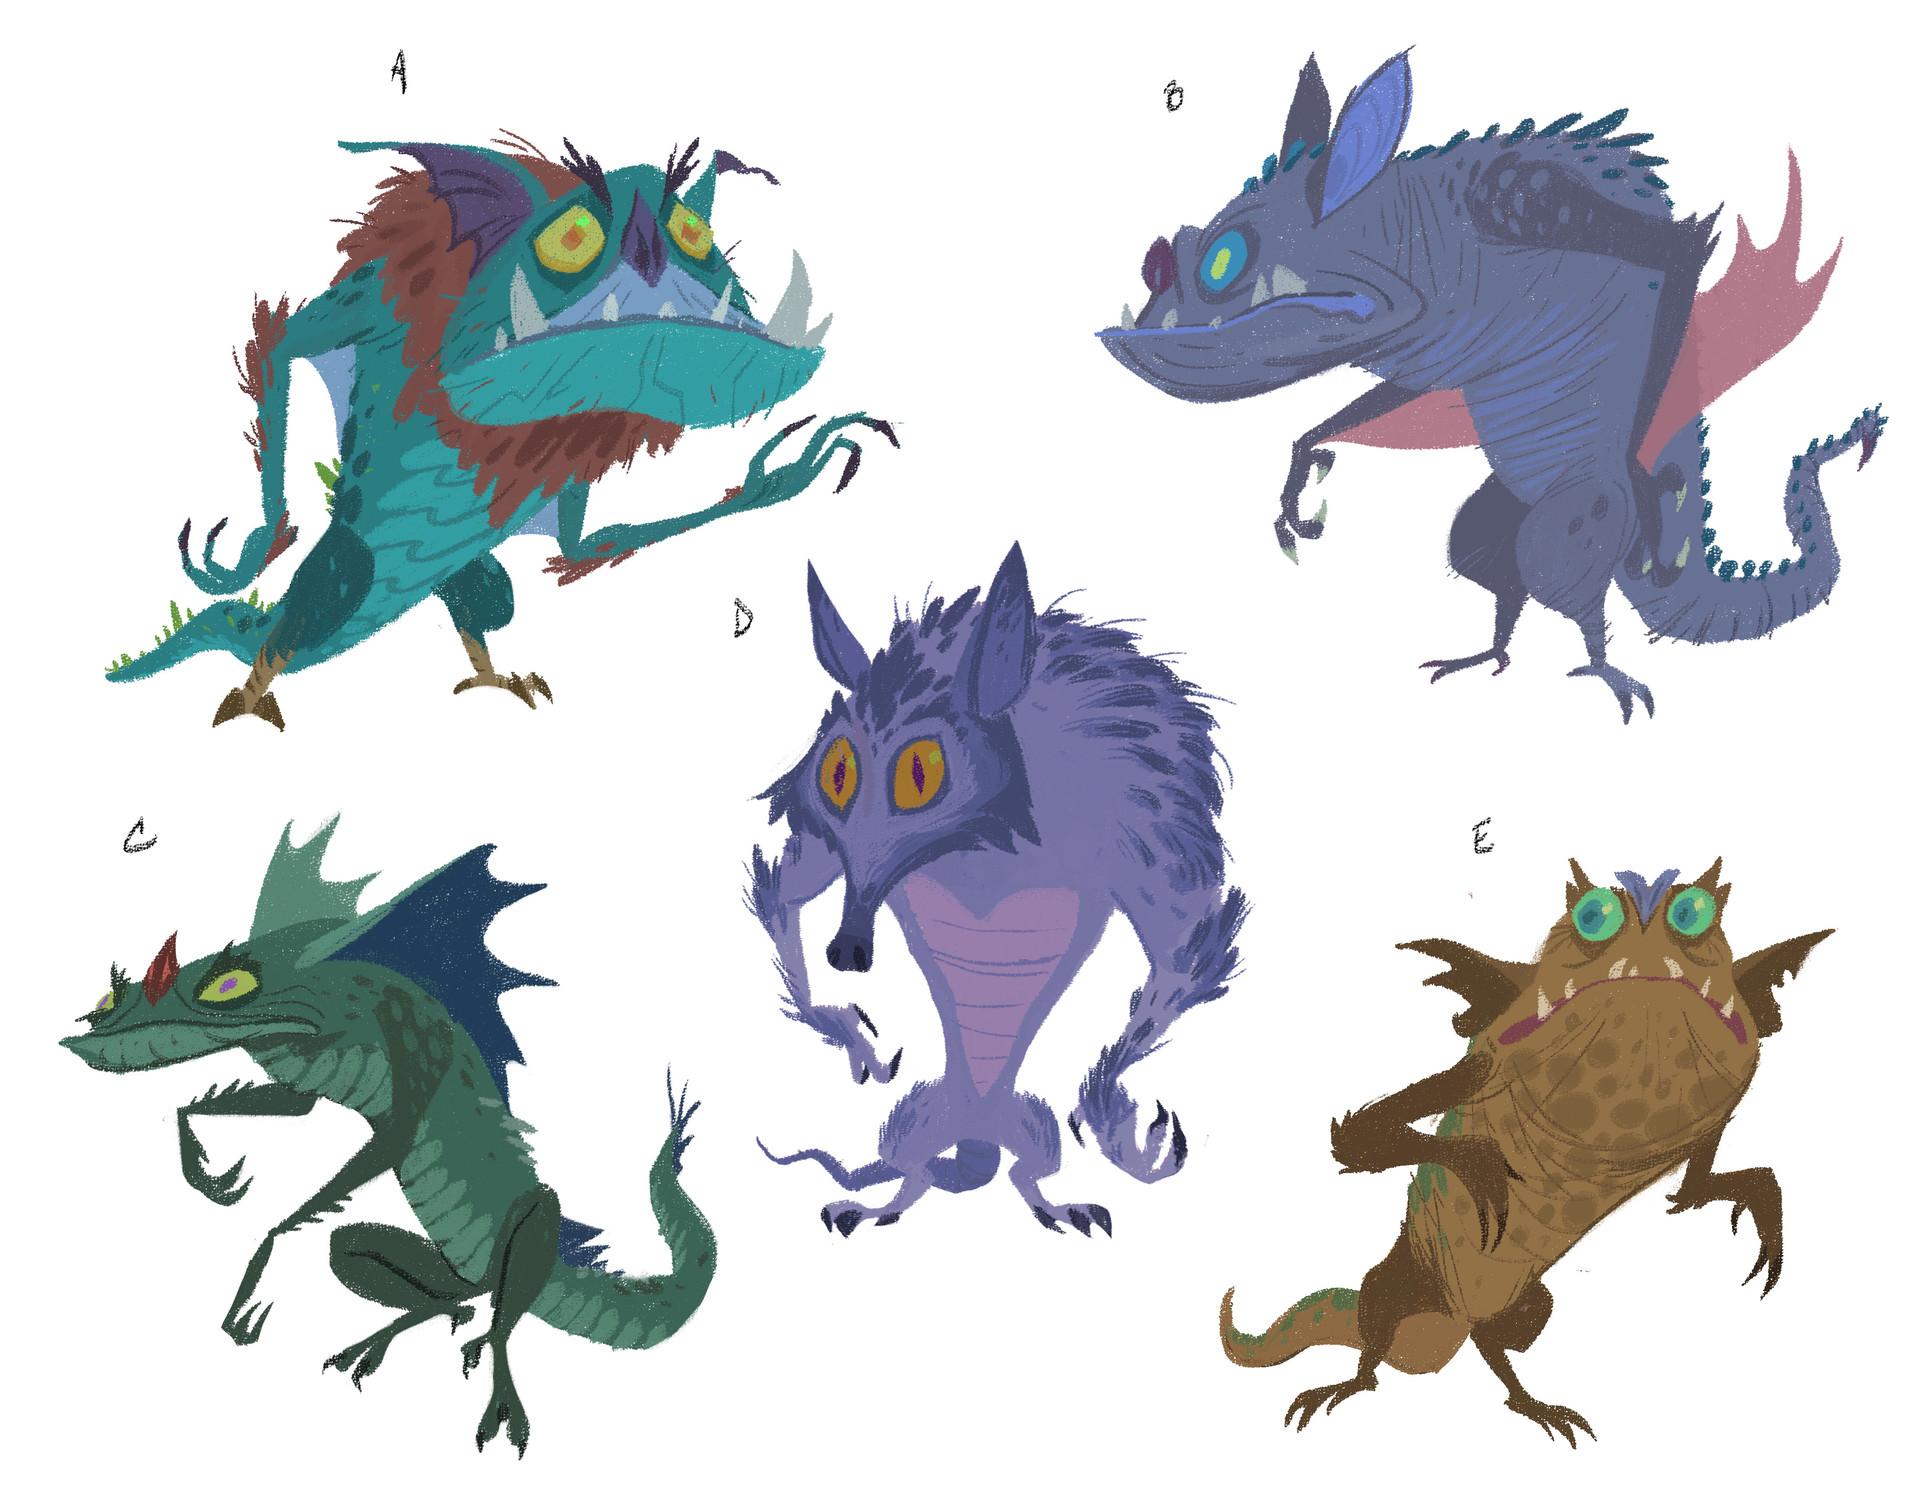 Rustam hasanov forest monster concepts